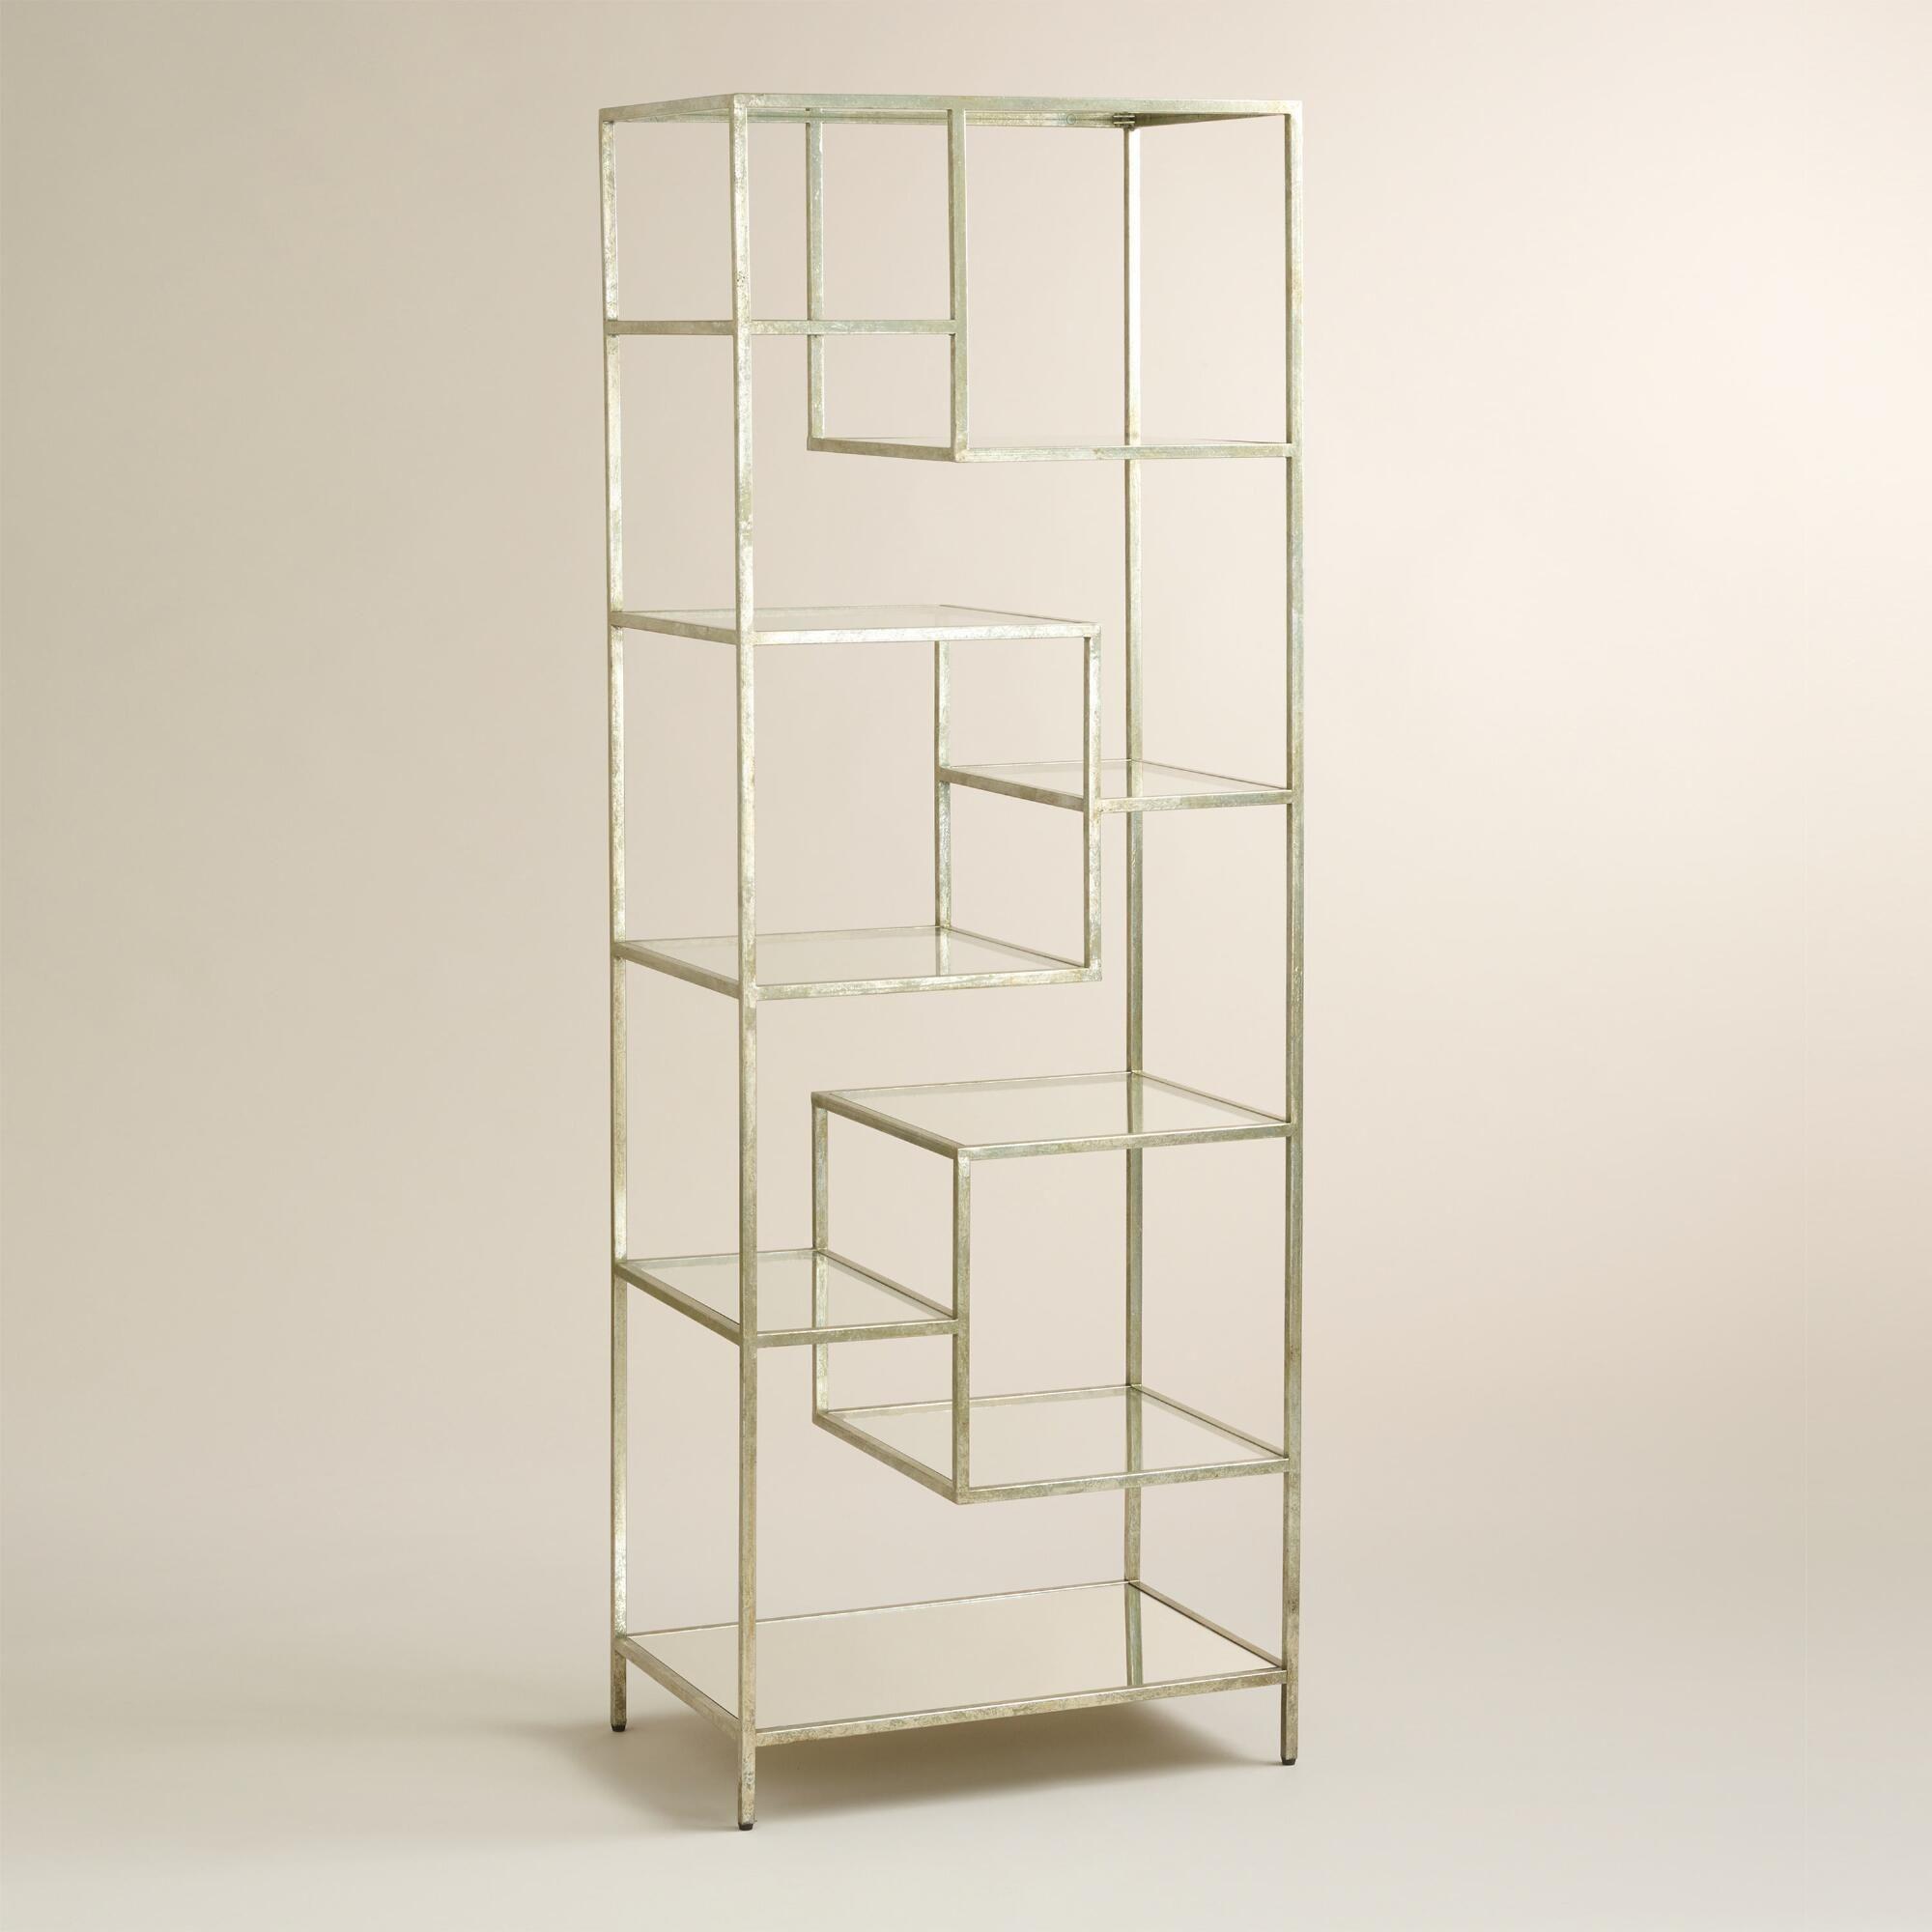 Burnished Metal And Glass Asymmetrical Kali Shelf Glass Bookcase Glass Shelves In Bathroom Glass Shelves